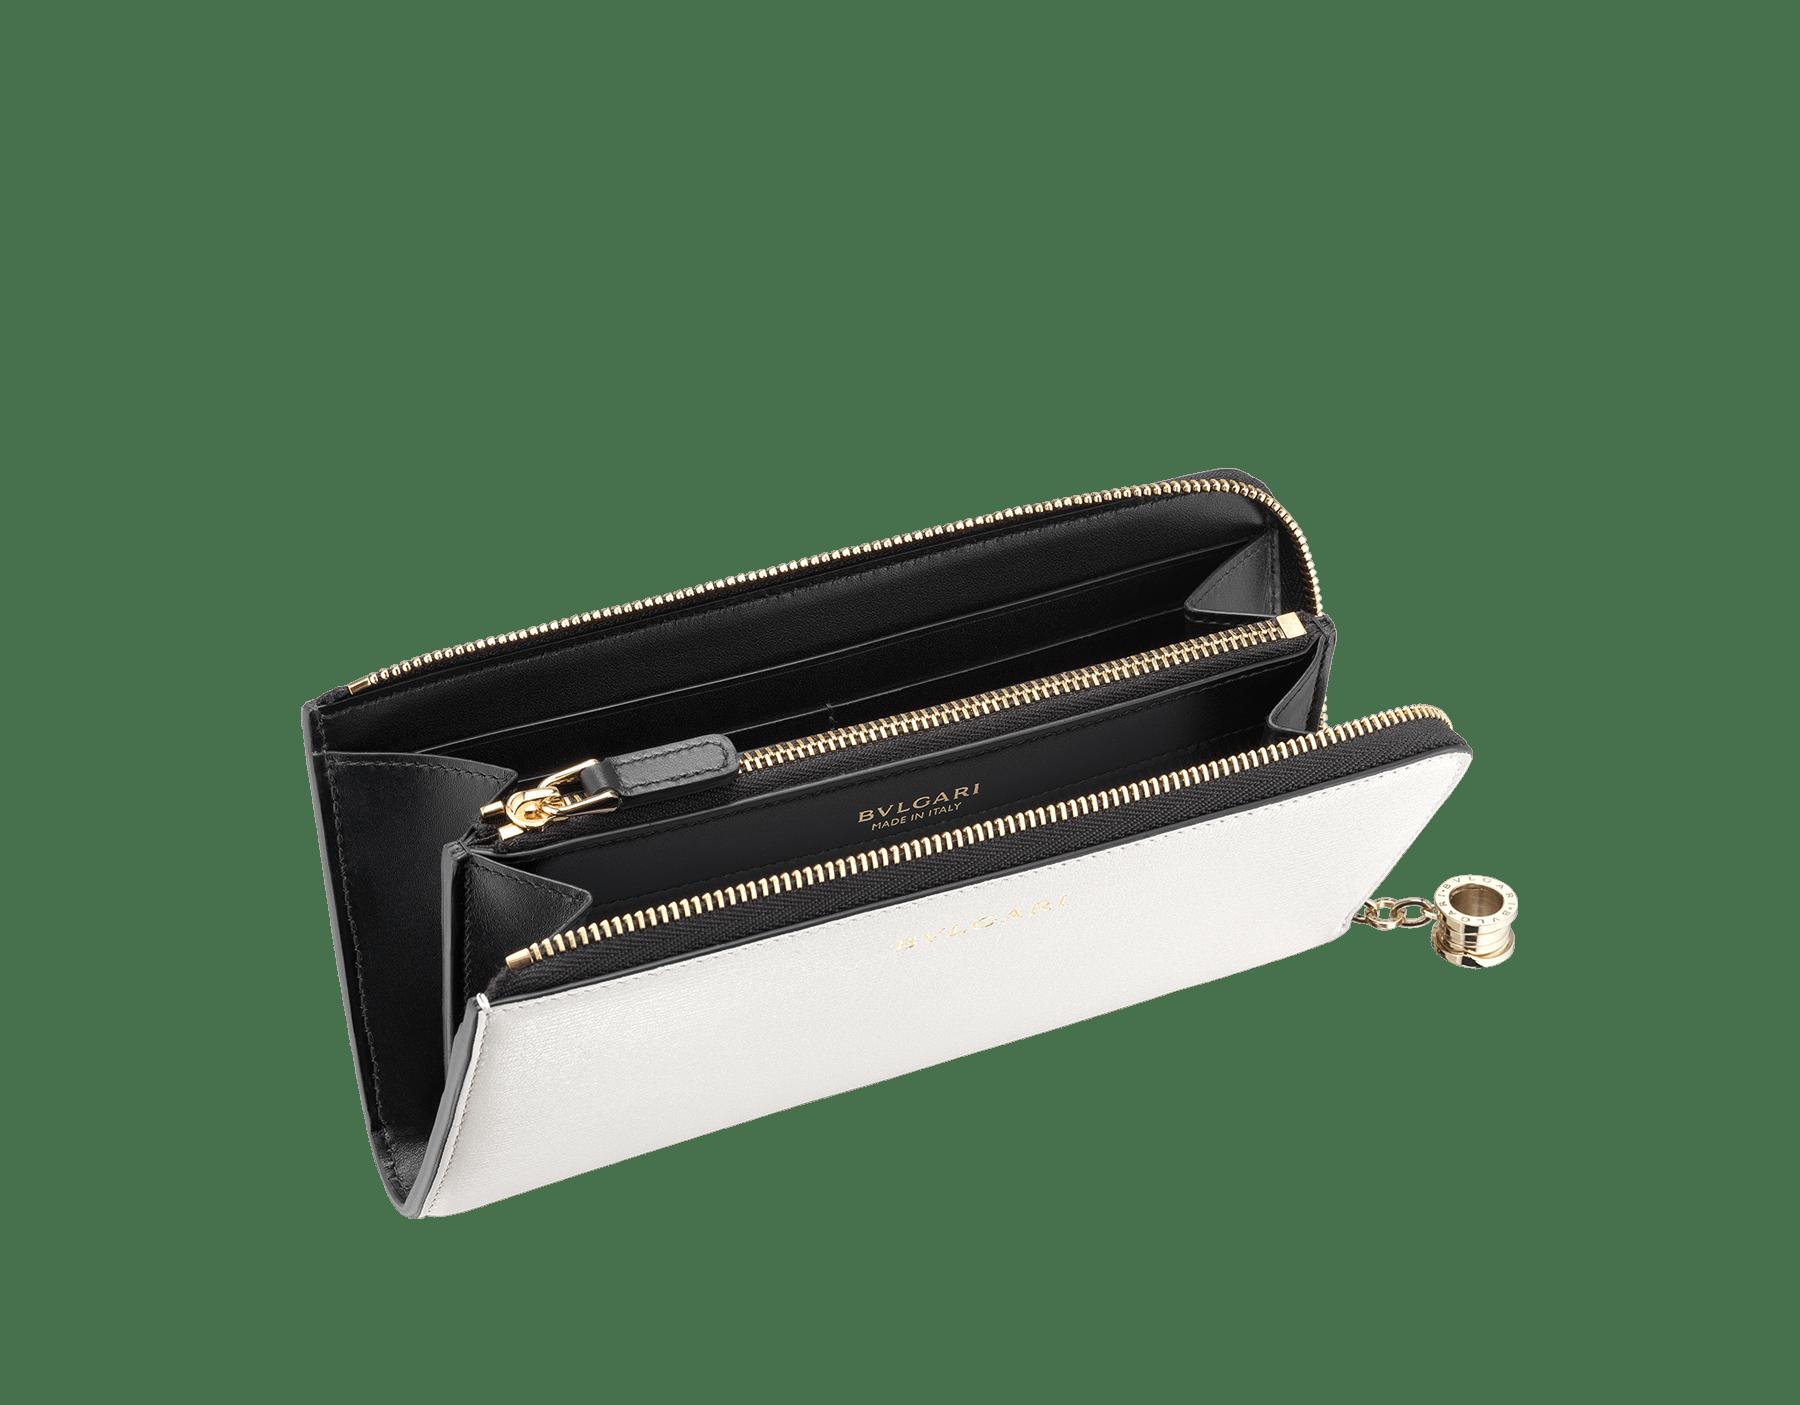 B.zero1 L-shaped zipped wallet in daisy topaz, taffy quartz goatskin and taffy quartz nappa. Iconic B.zero1 zip puller in light gold-plated brass. BZA-WLT-MZP-SLIM-L image 4